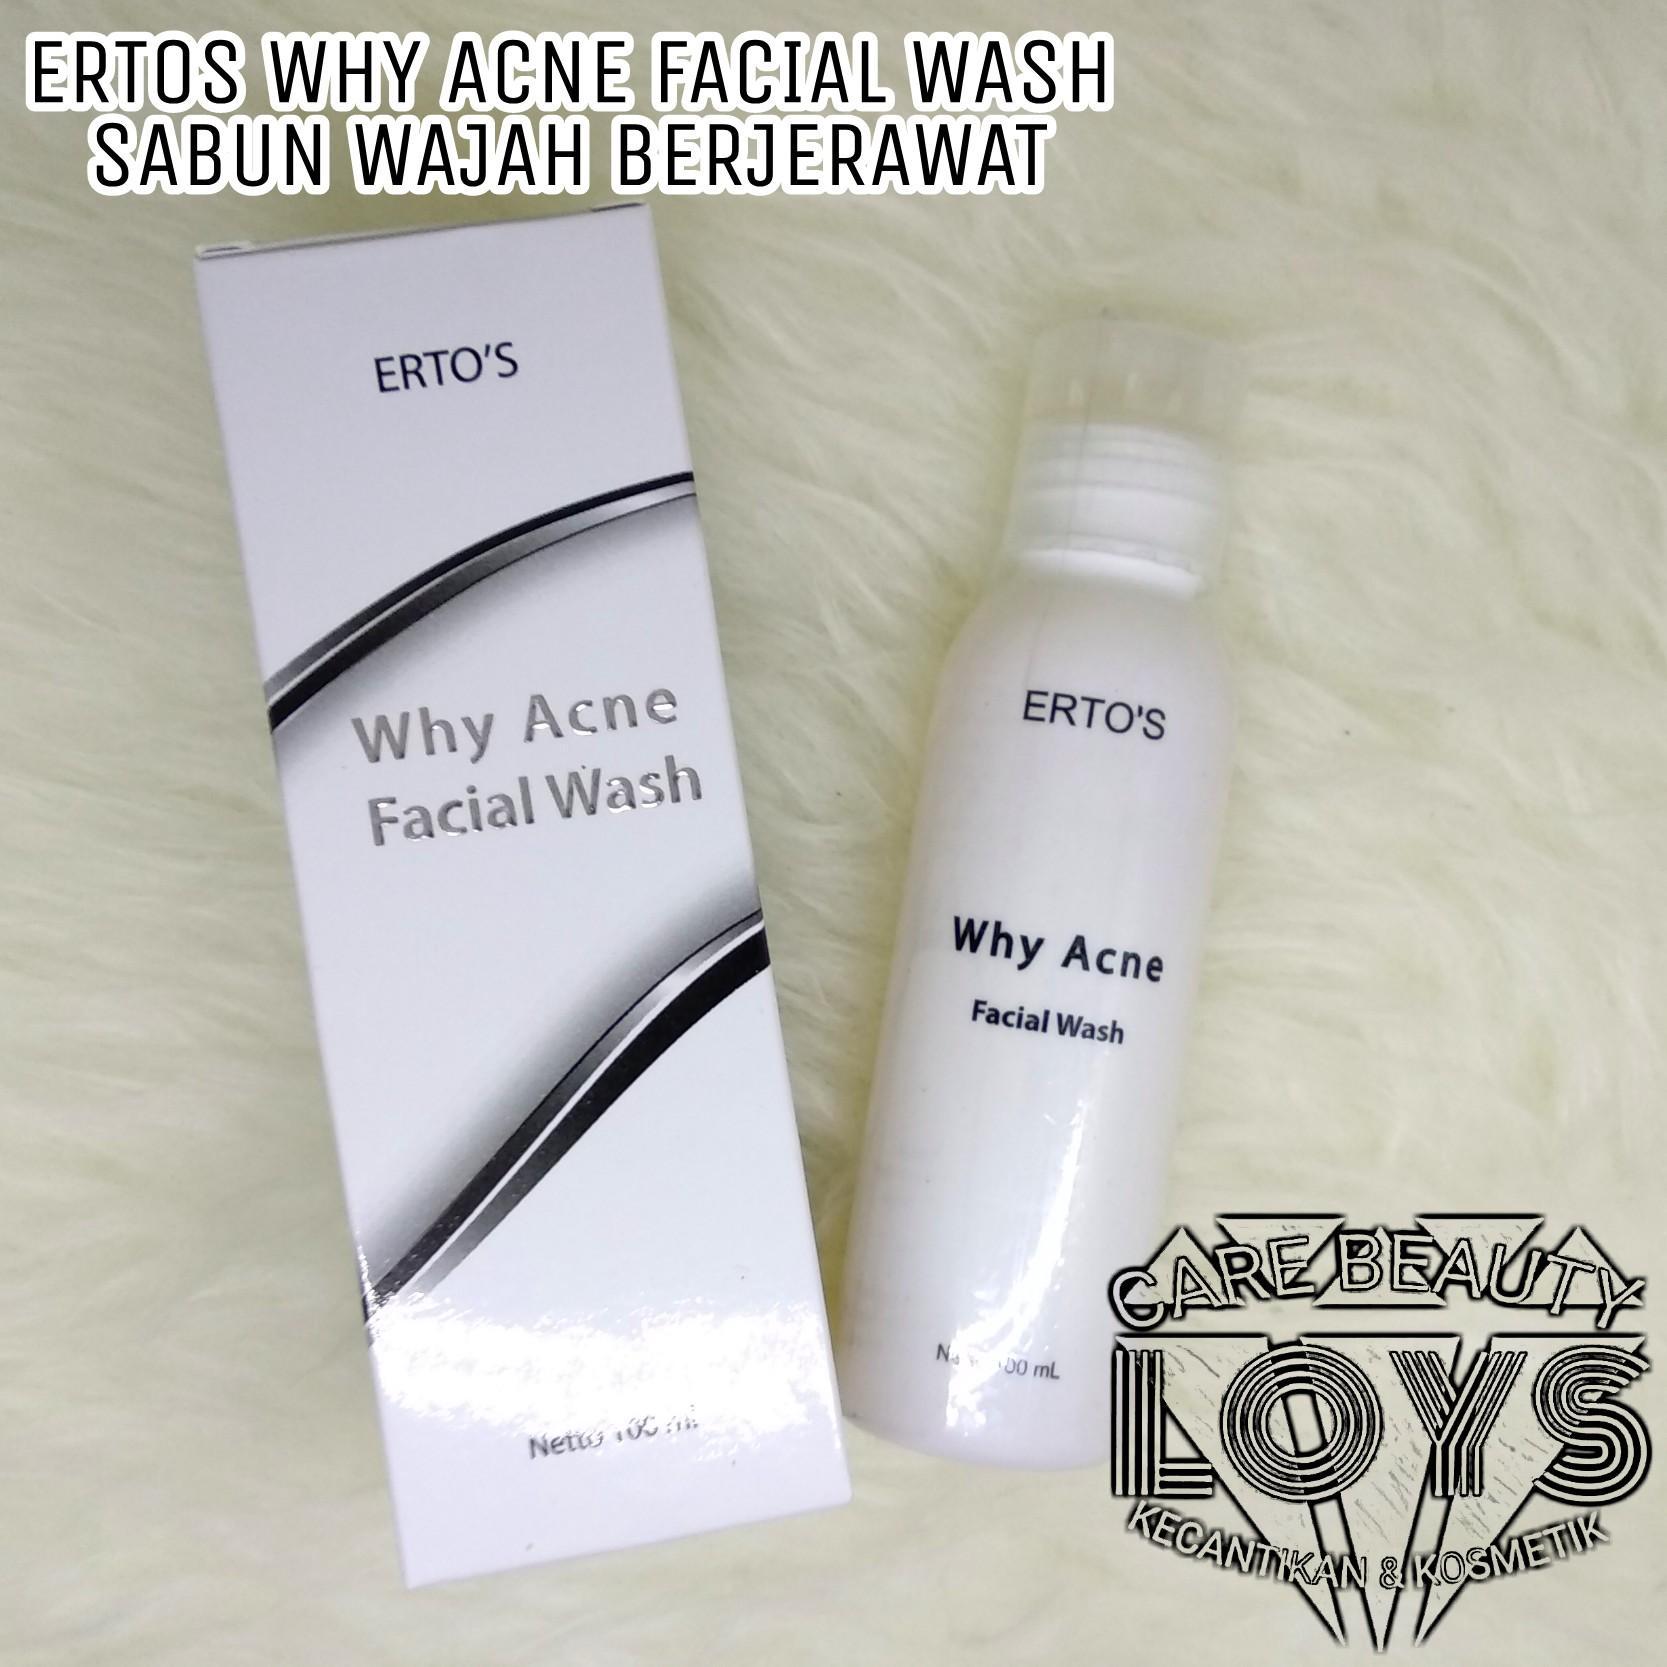 Kehebatan Facial Wash Temulawak Pasir Padi Bpom Sabun Cair Pembersih Wajah Ertos Why Acne Untuk Berjerawat 100ml